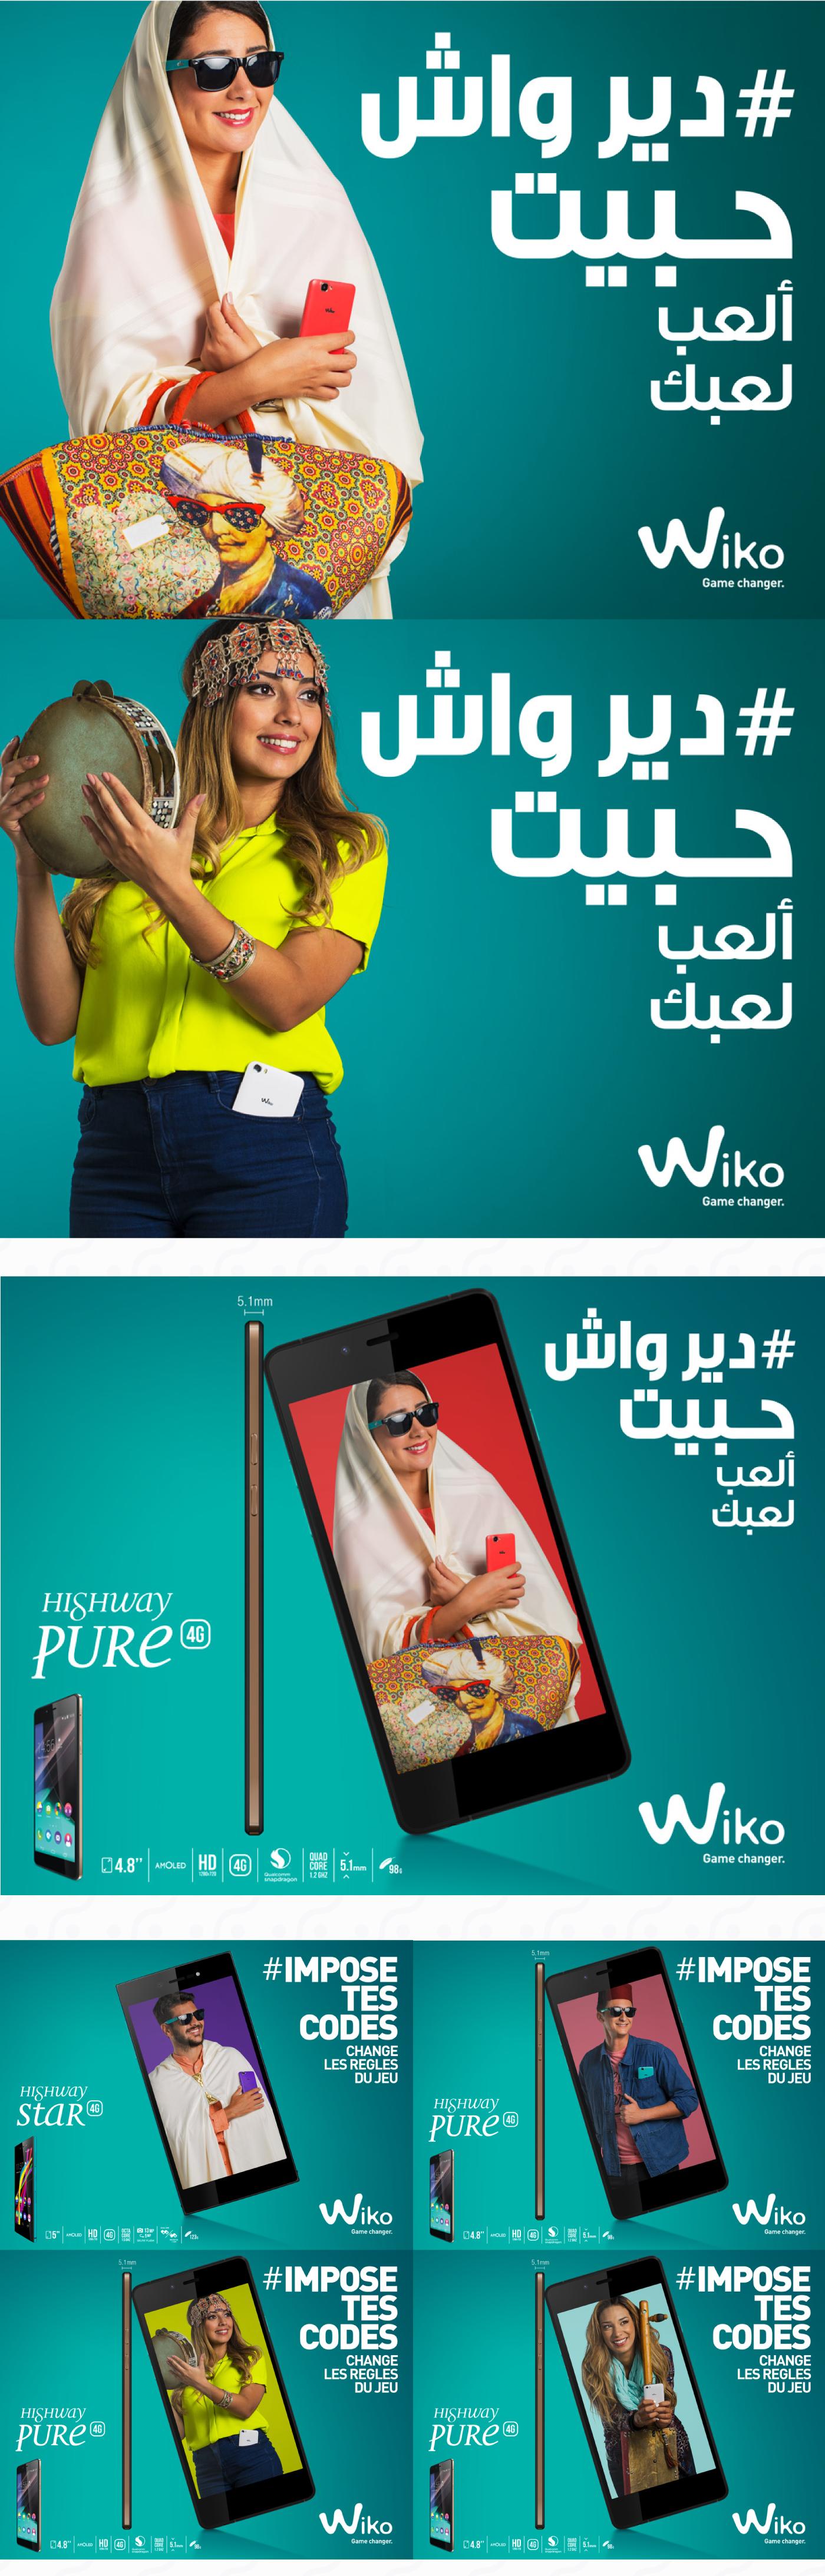 wiko,Algeria,phone,design,Fashion ,origins,arabic,Berber,Style,colors